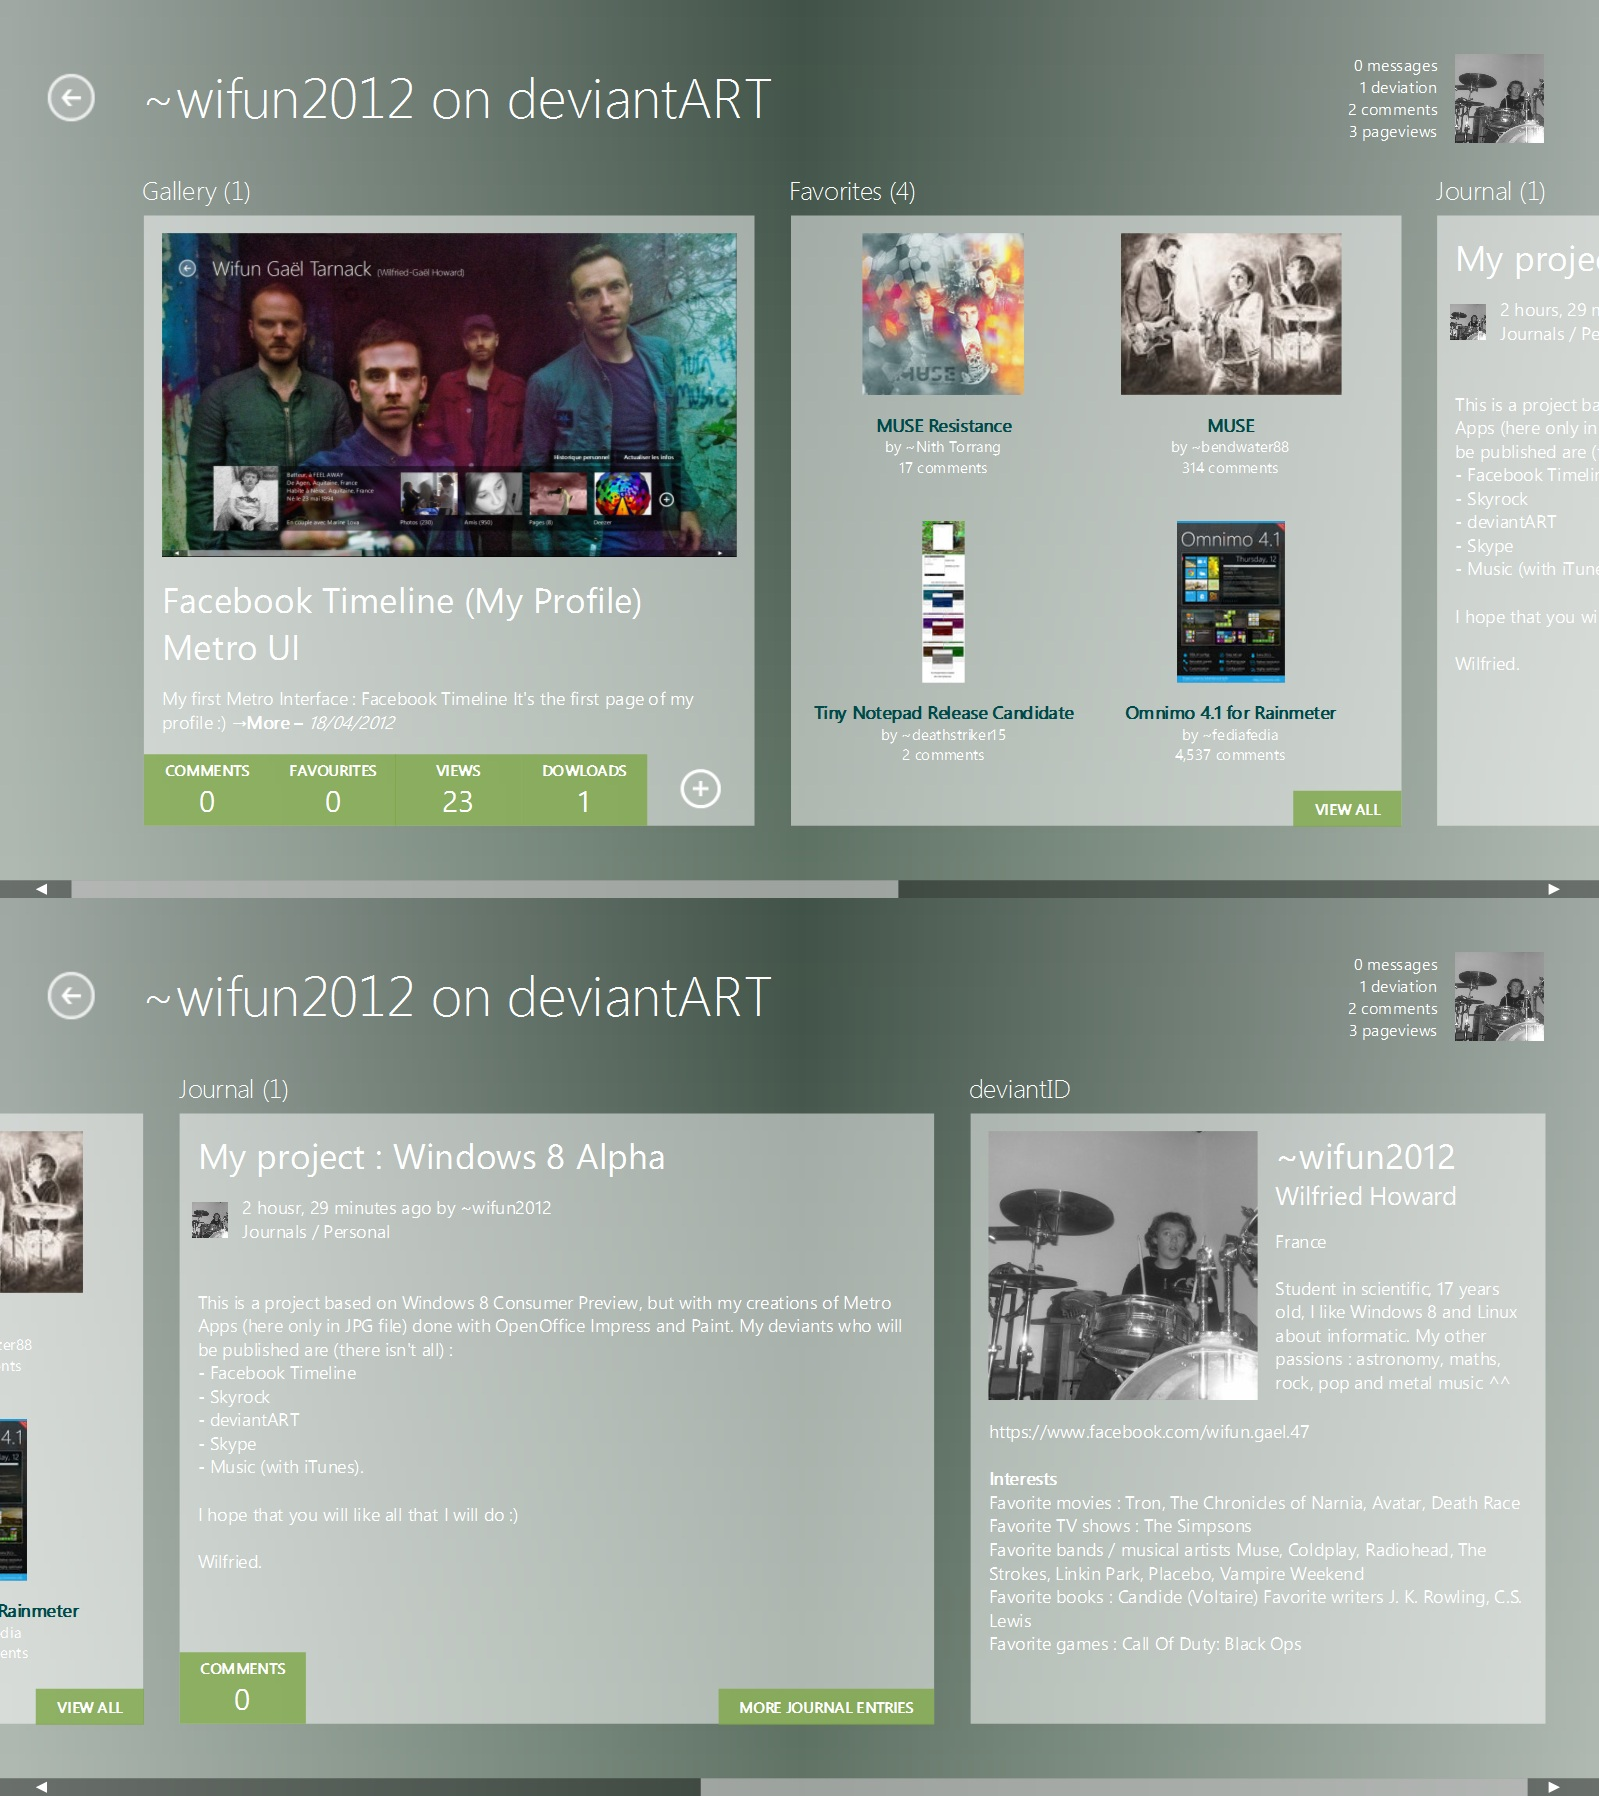 deviantART Profile Metro UI by wifun2012